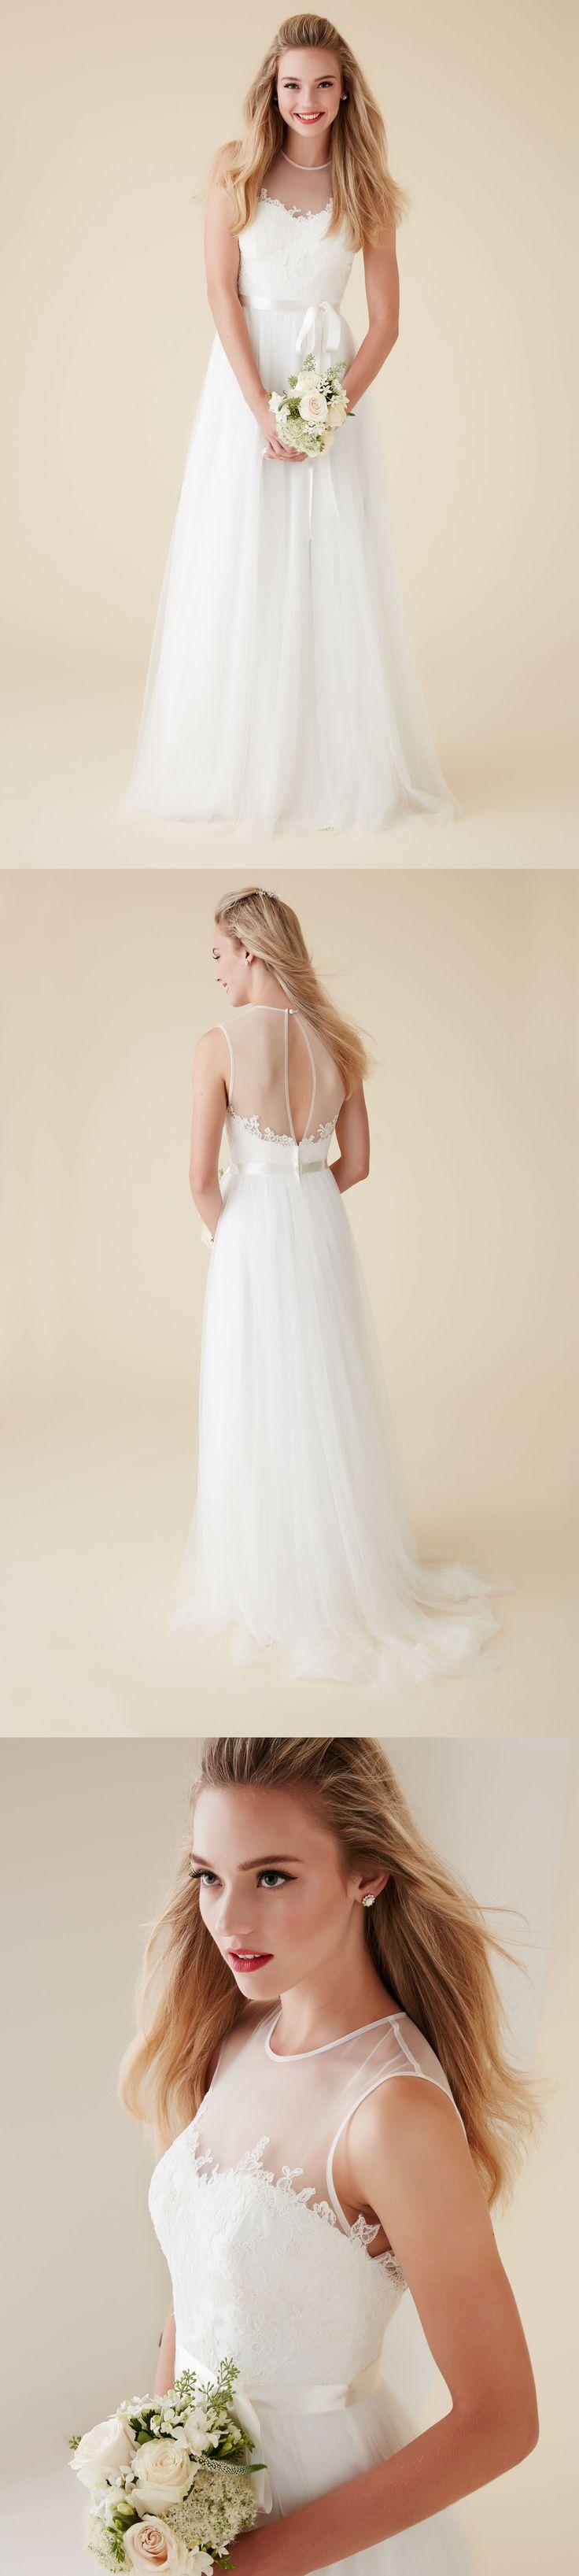 Best 25 Sleeveless wedding dresses ideas on Pinterest